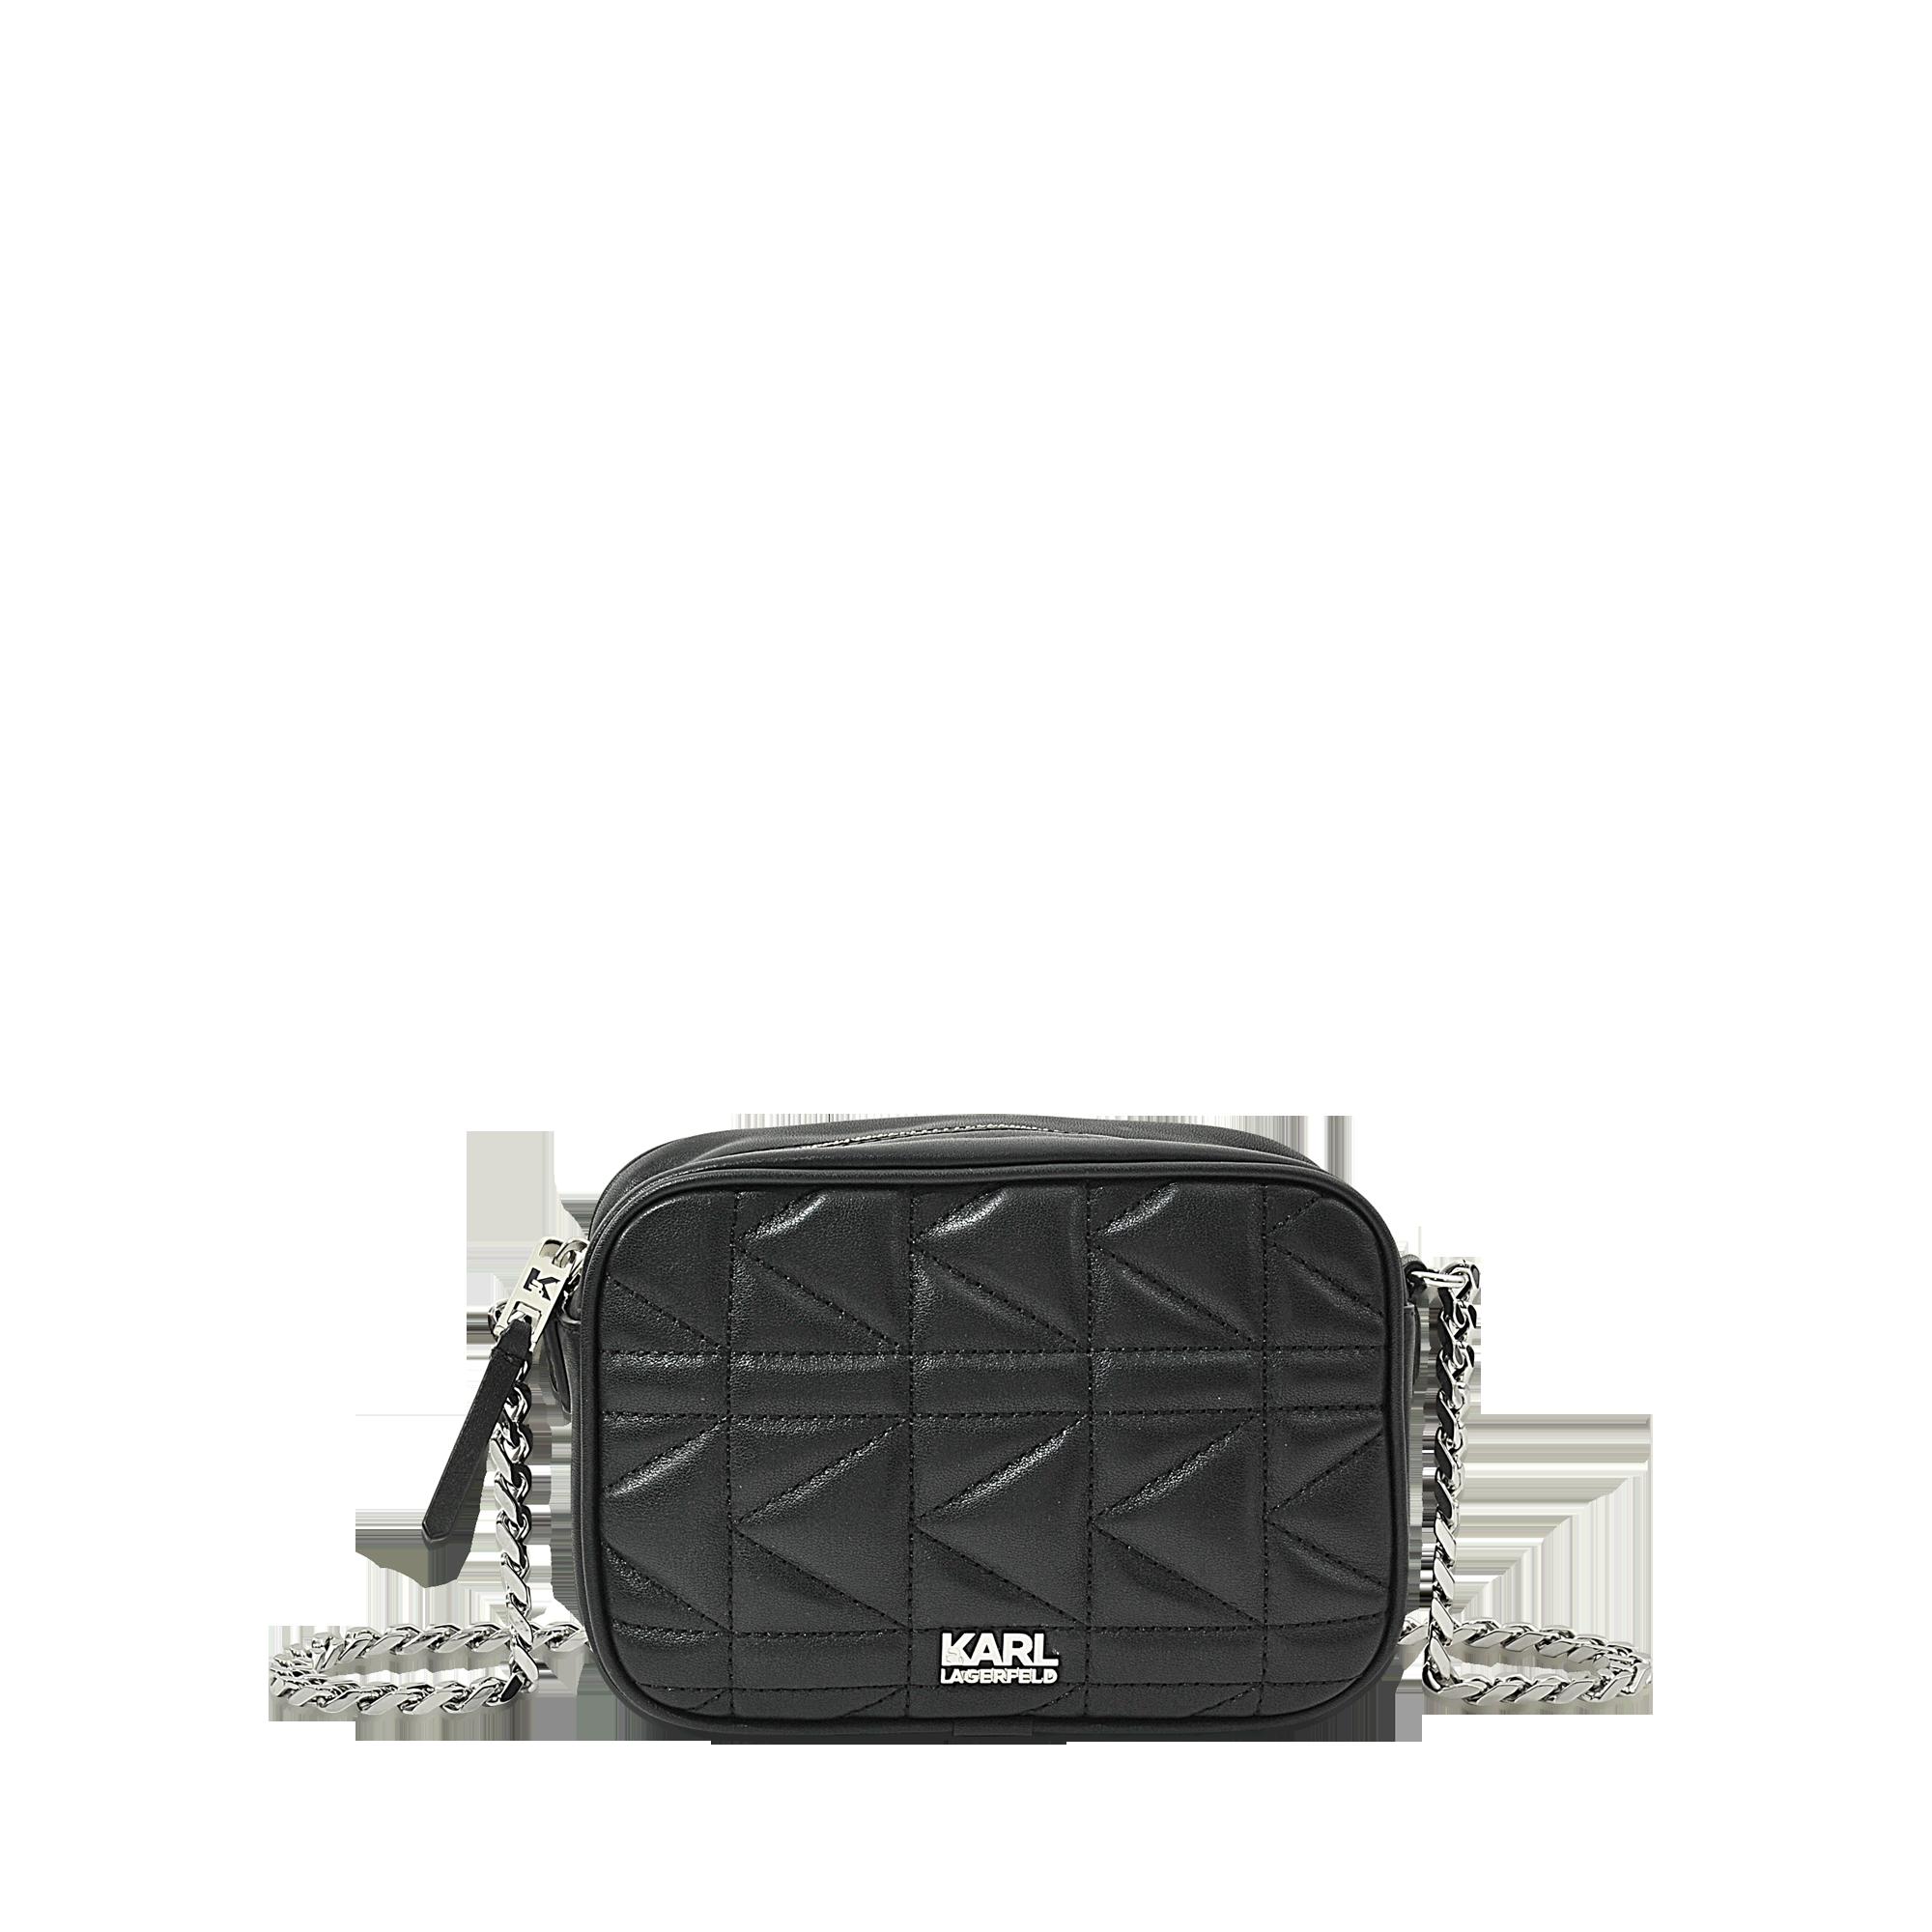 Karl Lagerfeld K Kuilted Small crossbody Ebay Goedkope Prijs Uitverkoop Exclusieve Outlet Nieuwe q9W96D0P